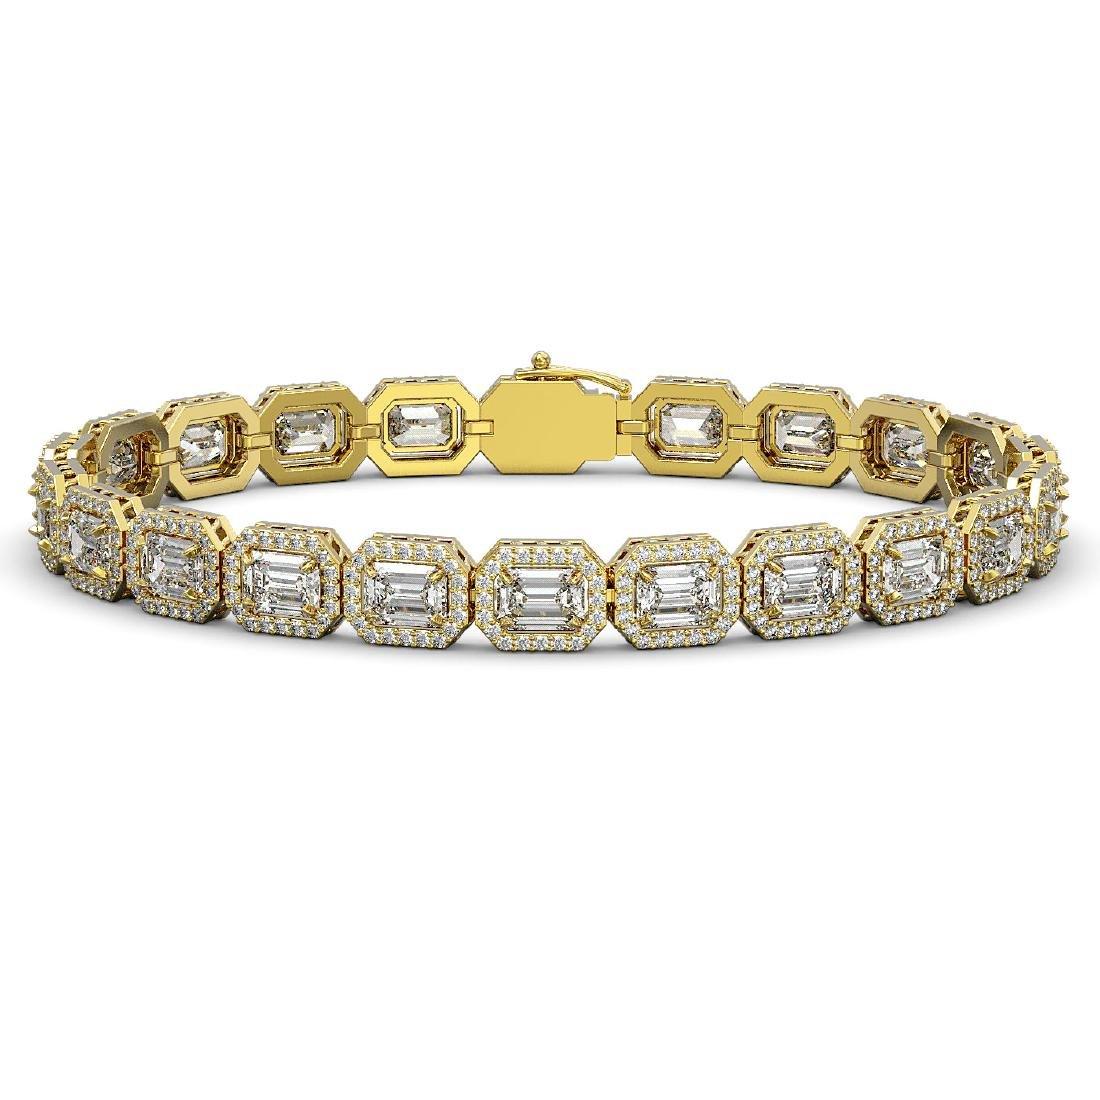 16.72 CTW Emerald Cut Diamond Designer Bracelet 18K